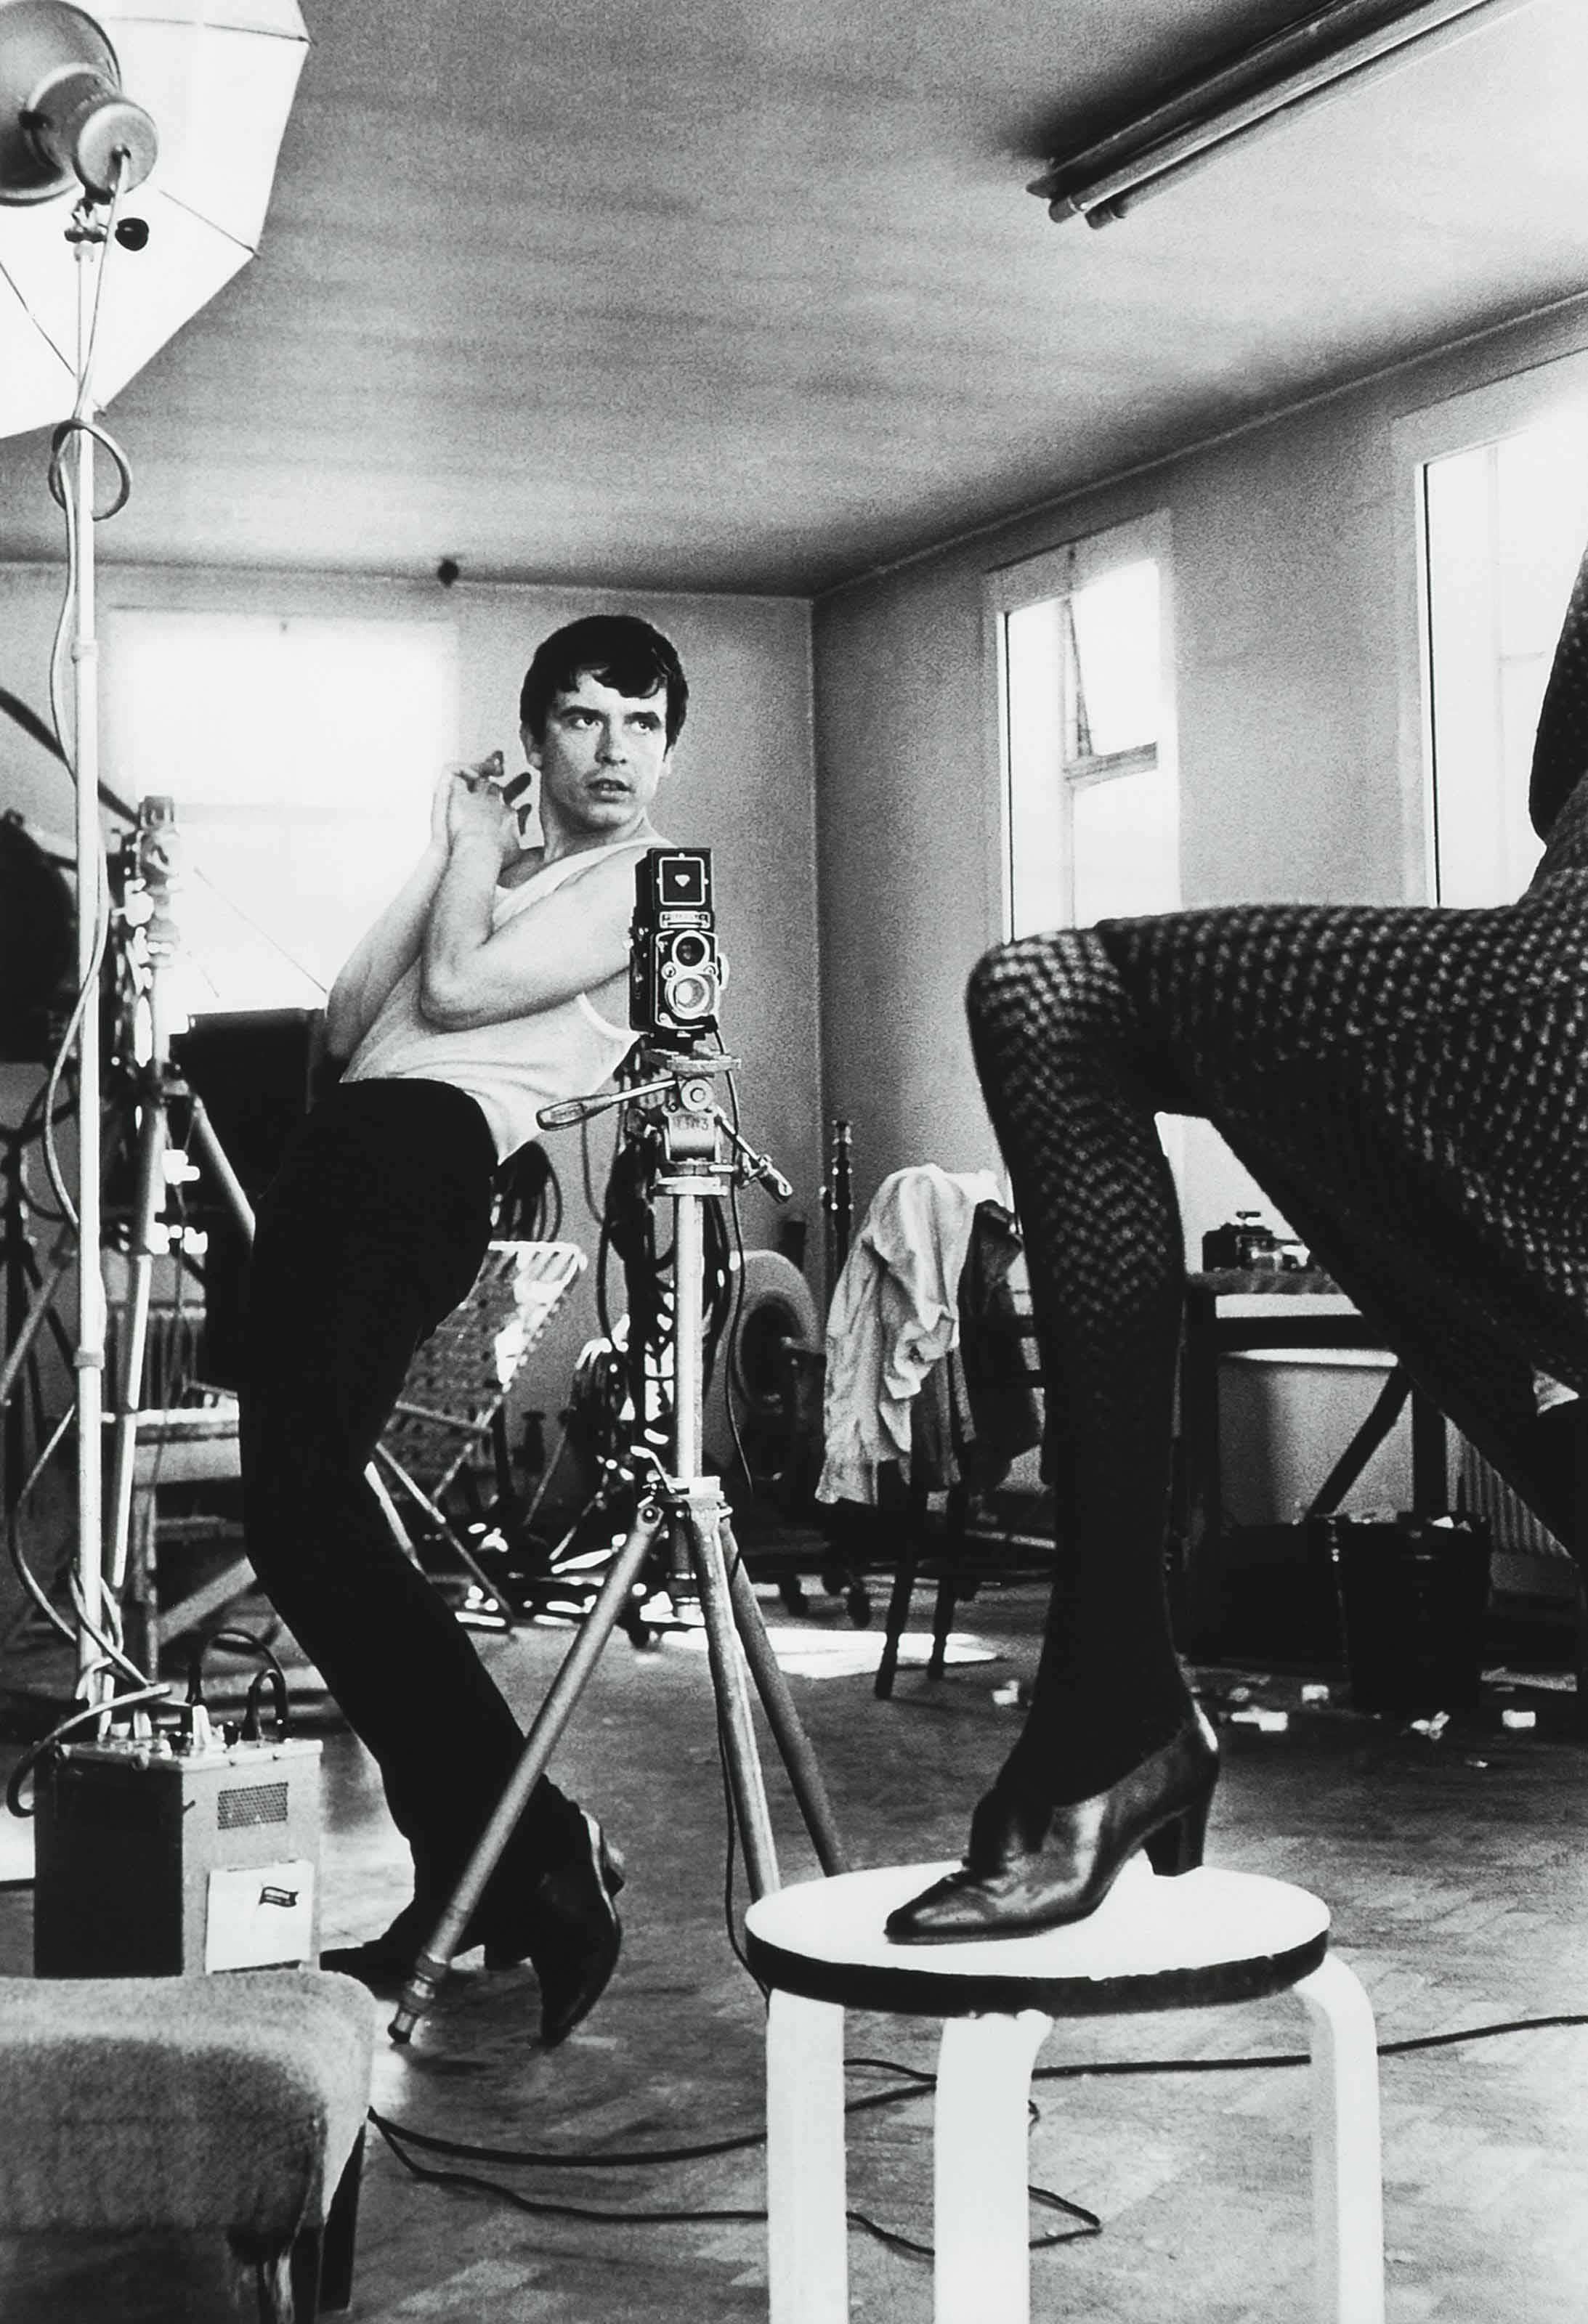 David Bailey, 1967